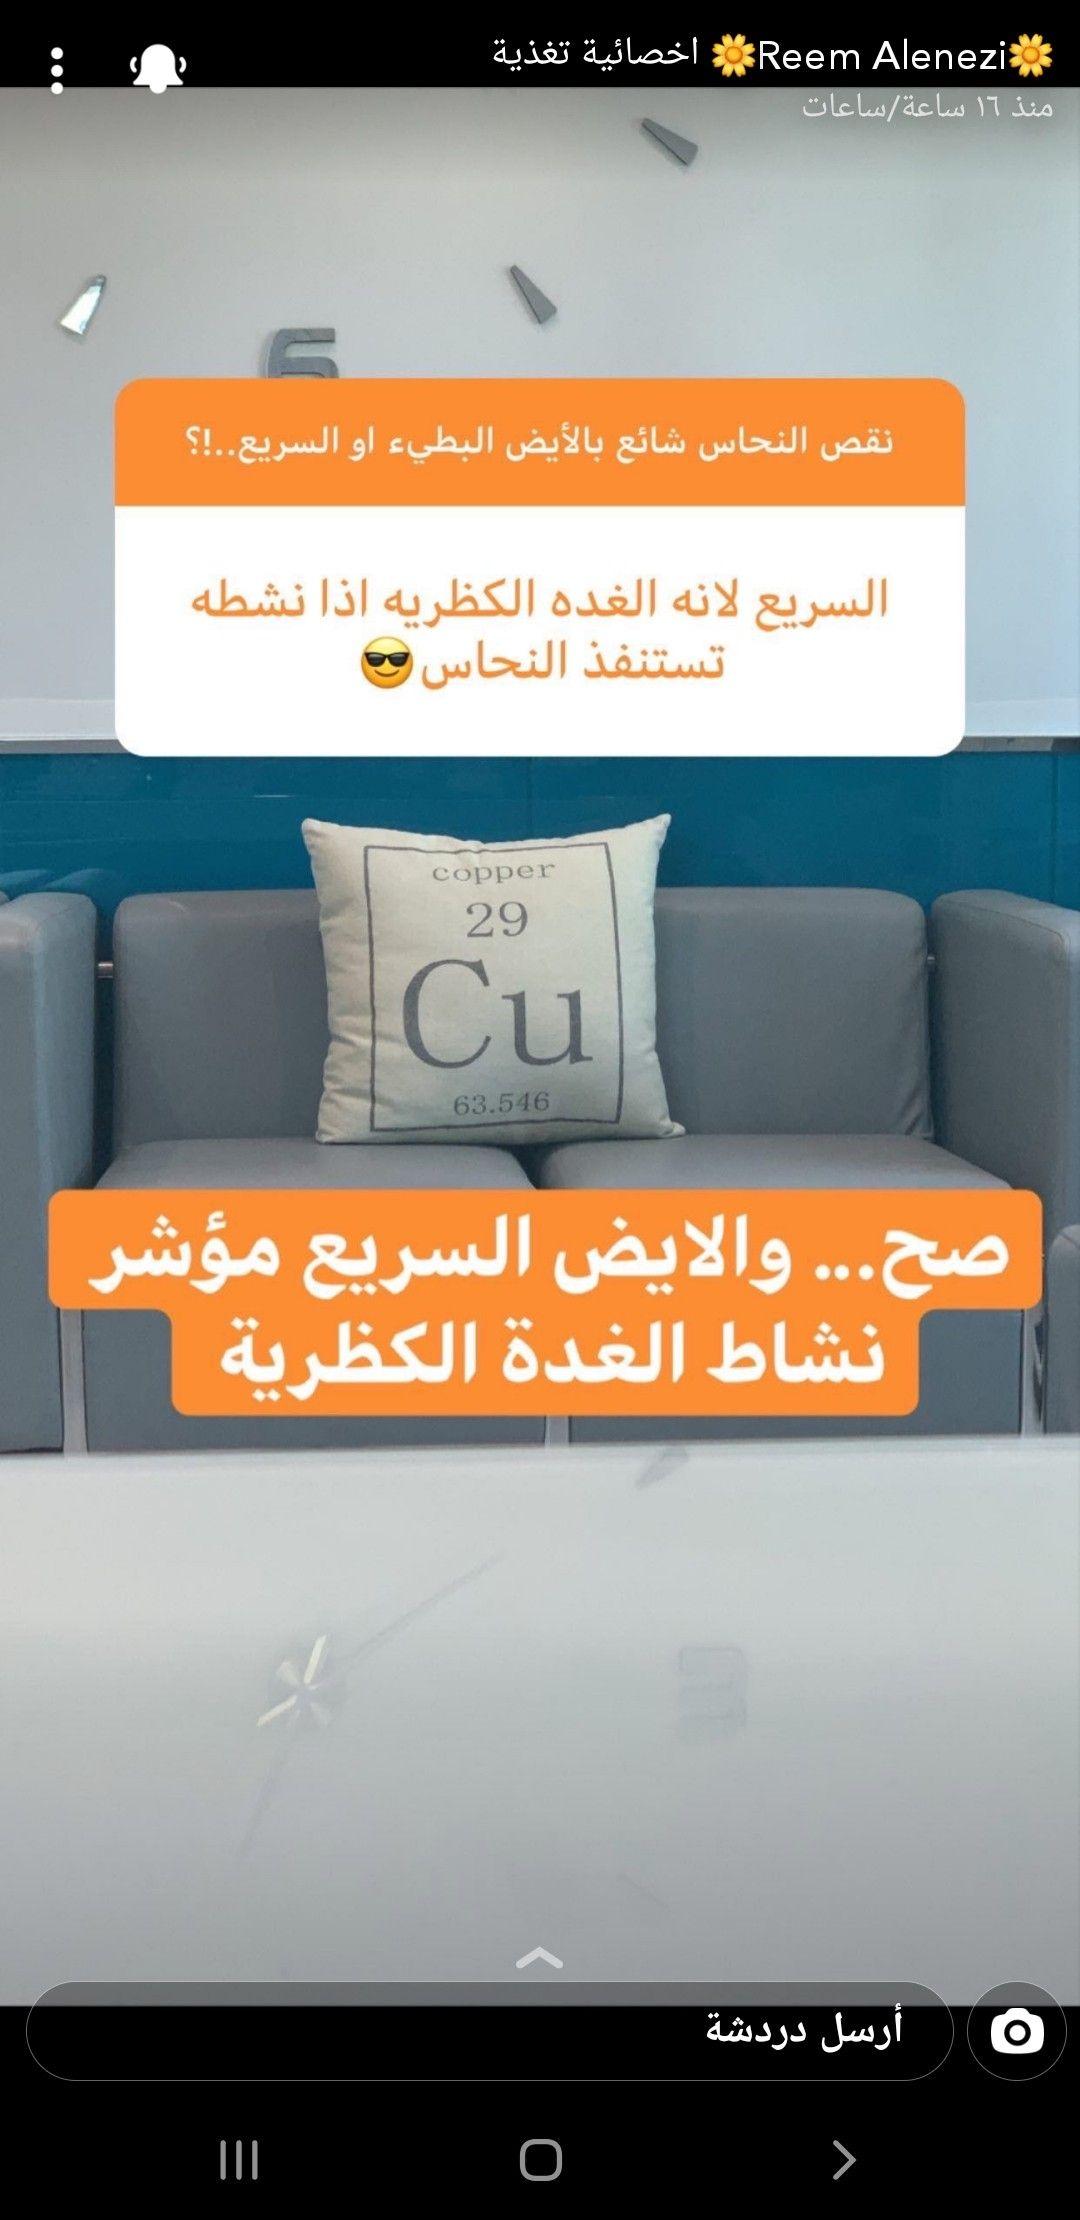 Pin By Aman On تغذية علاجية المعدة بيت الداء و الدواء توعية Home Decor Decals Bed Pillows Pillows